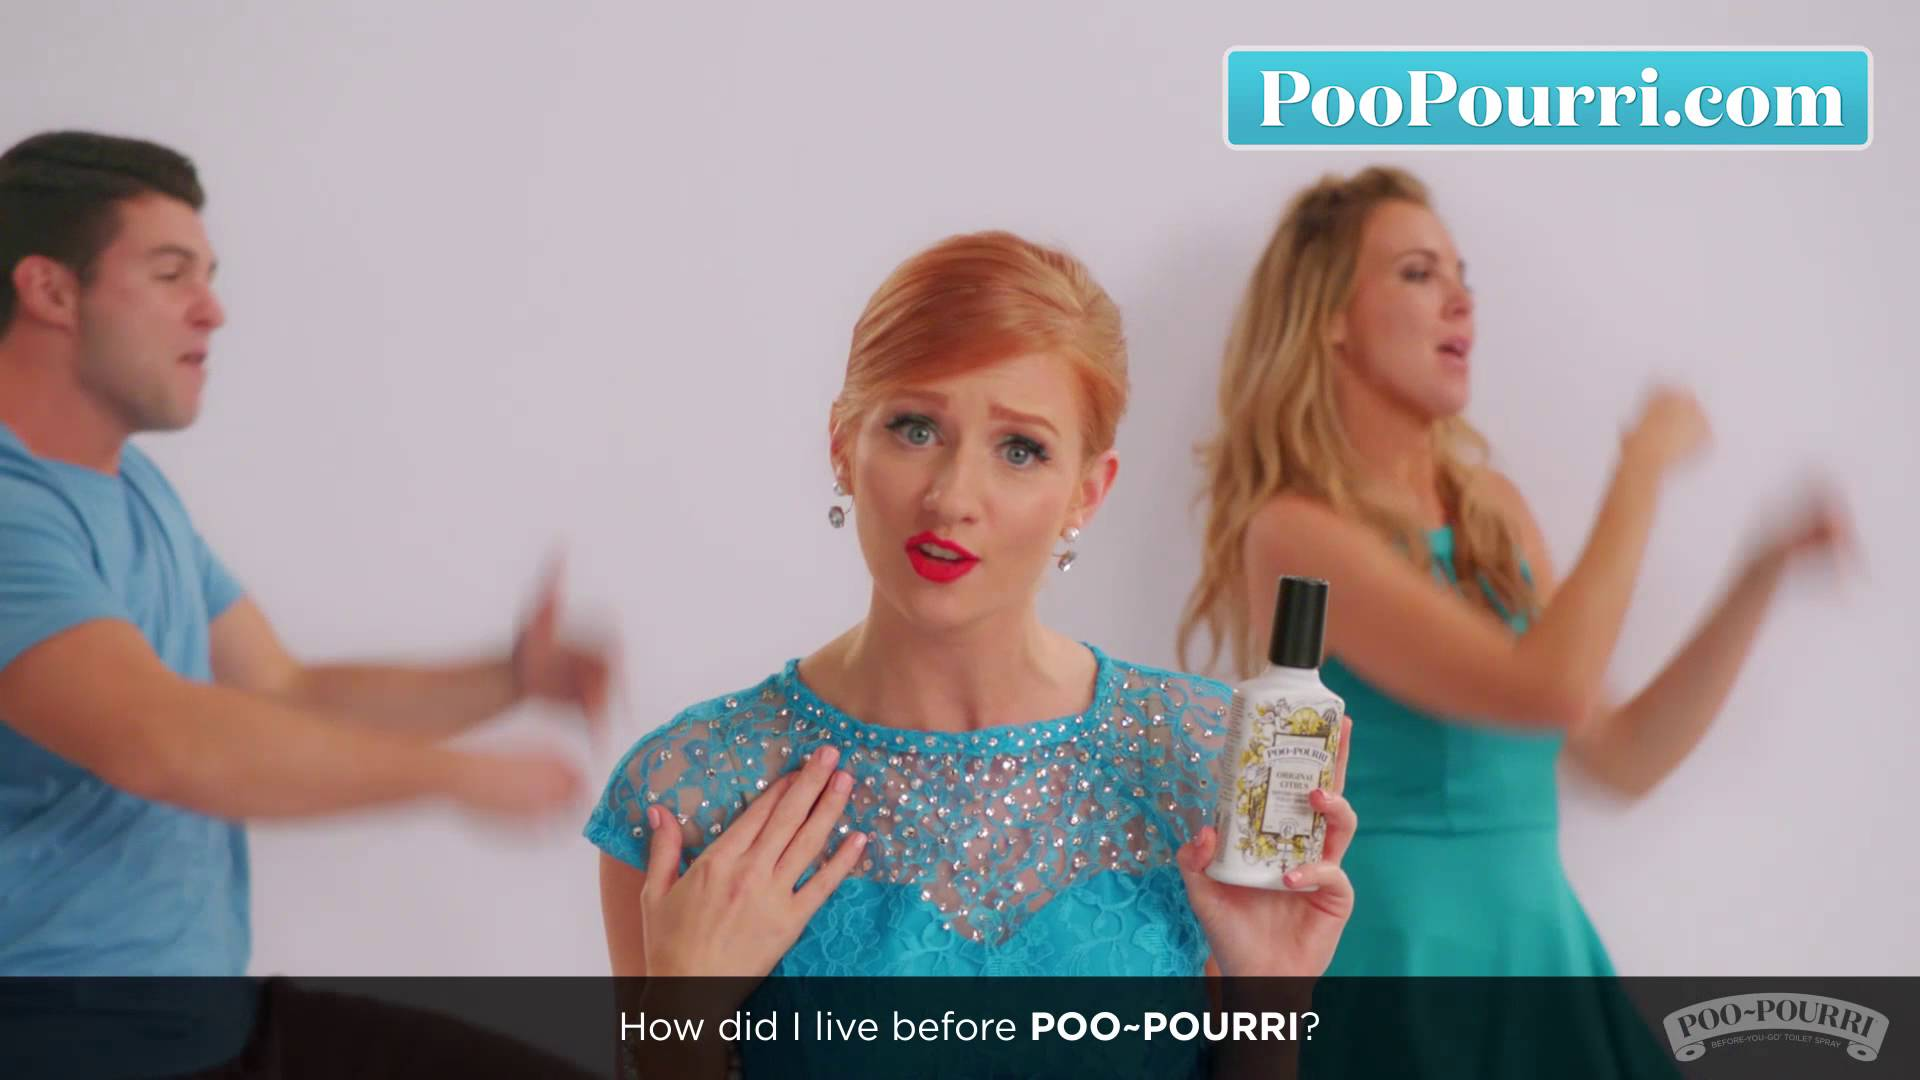 「誰說便便一定臭!Poo-Pourri 廣告歌讓人好心動~」- Imagine Where You Can GO - PooPourri.com